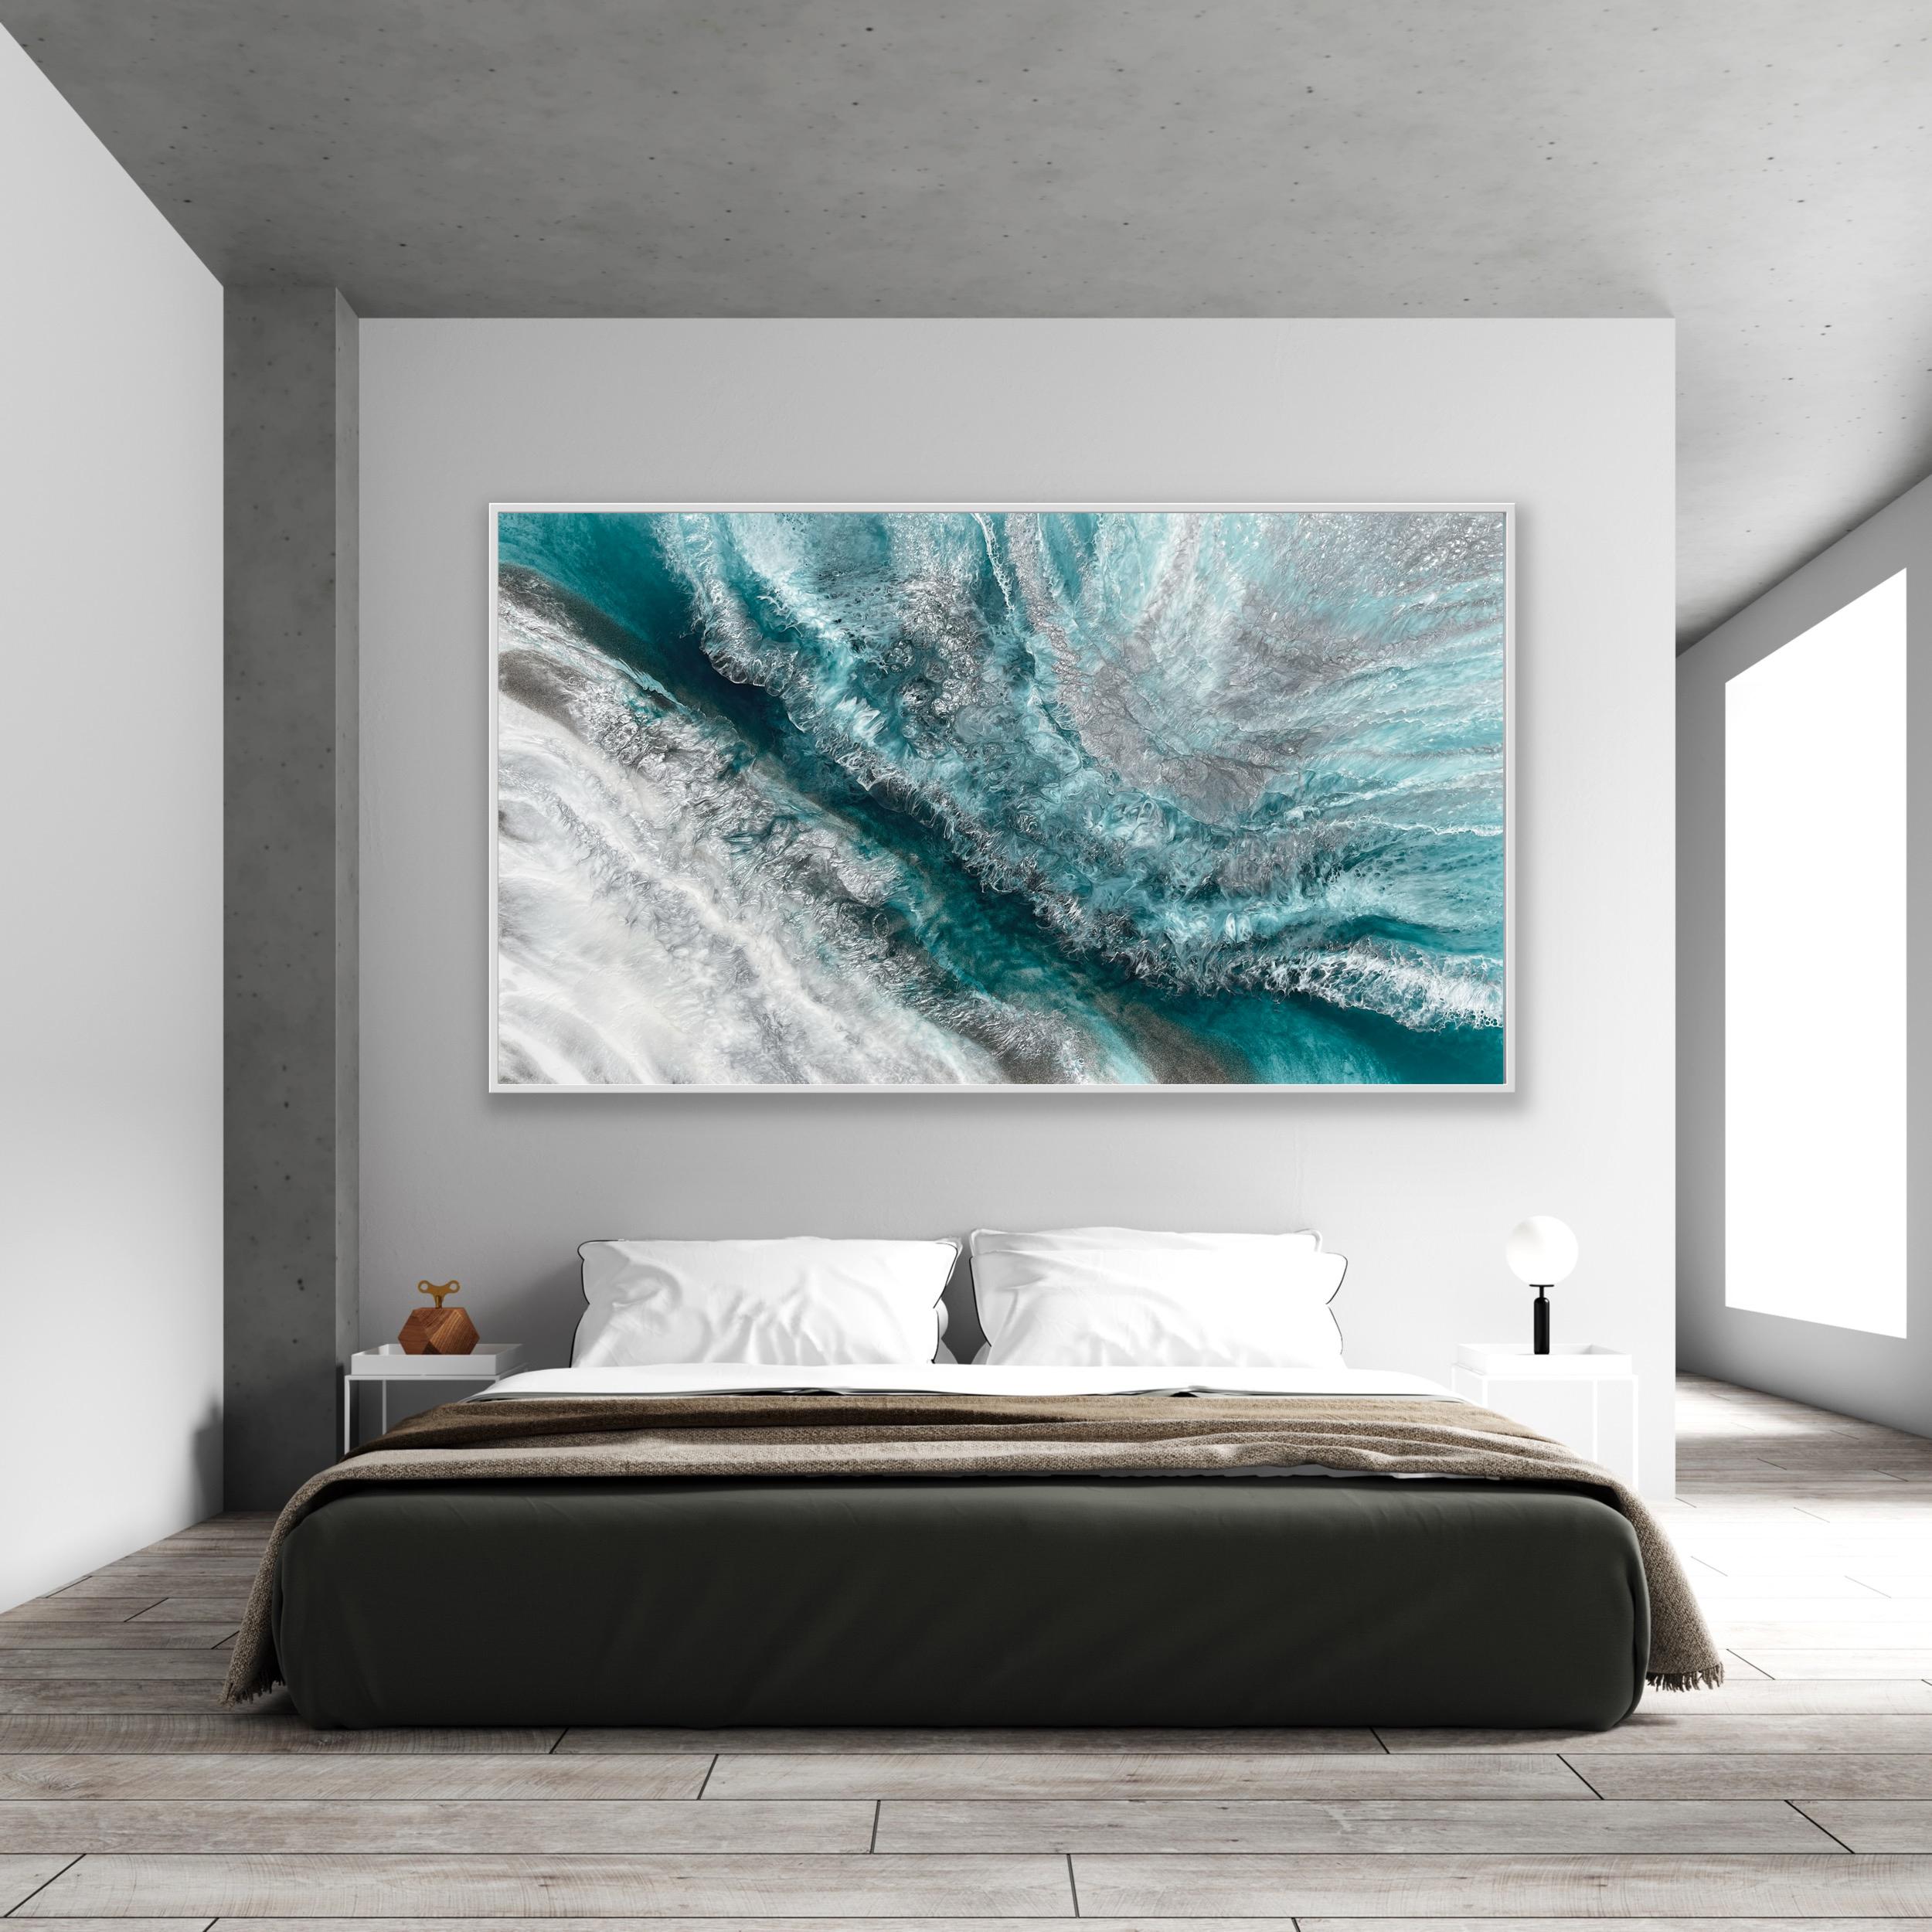 Oceanjewlesbedroom